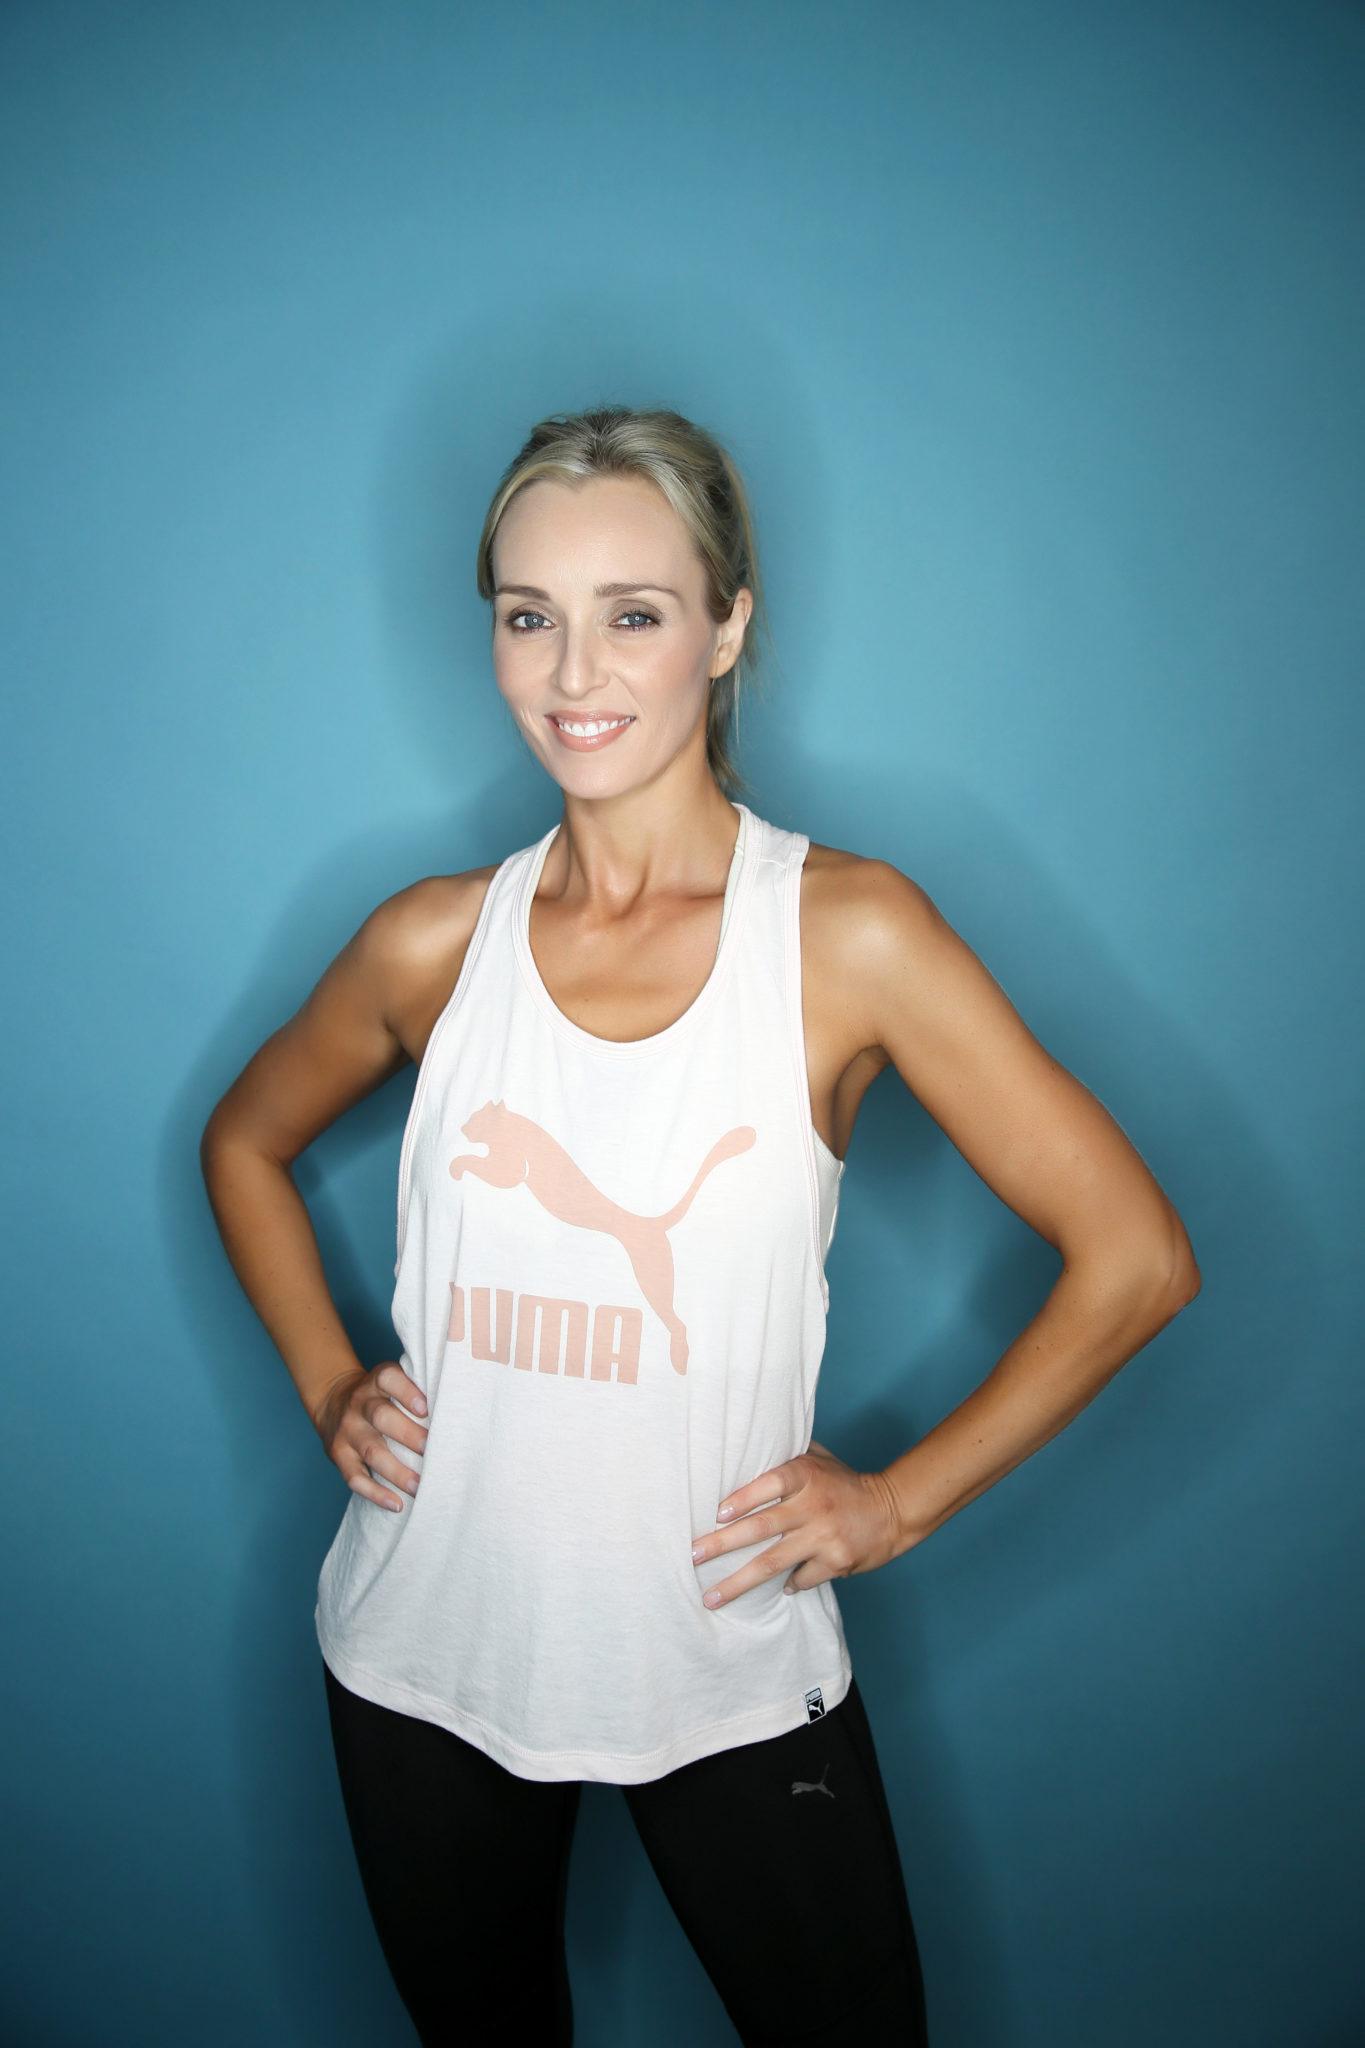 PUMA Ambassadors Siobhan Byrne training tips